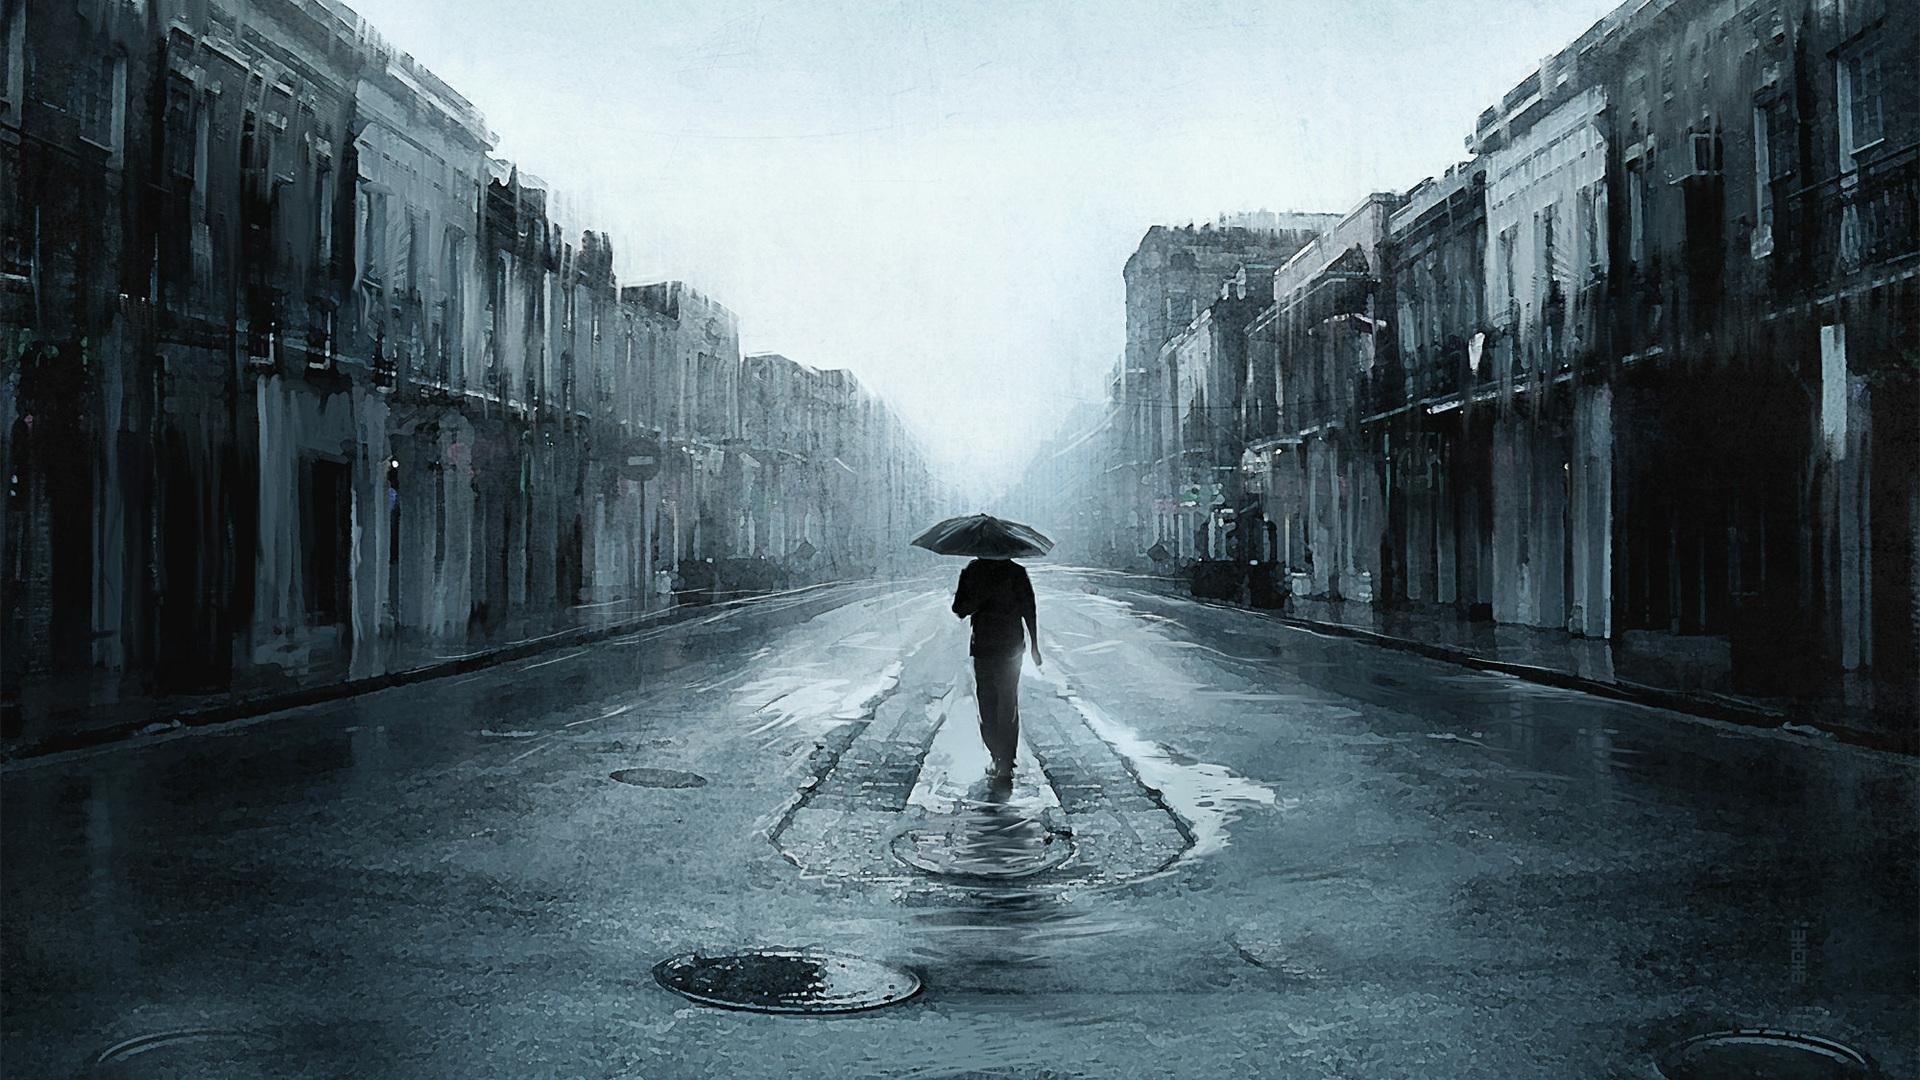 Walling In The Rain